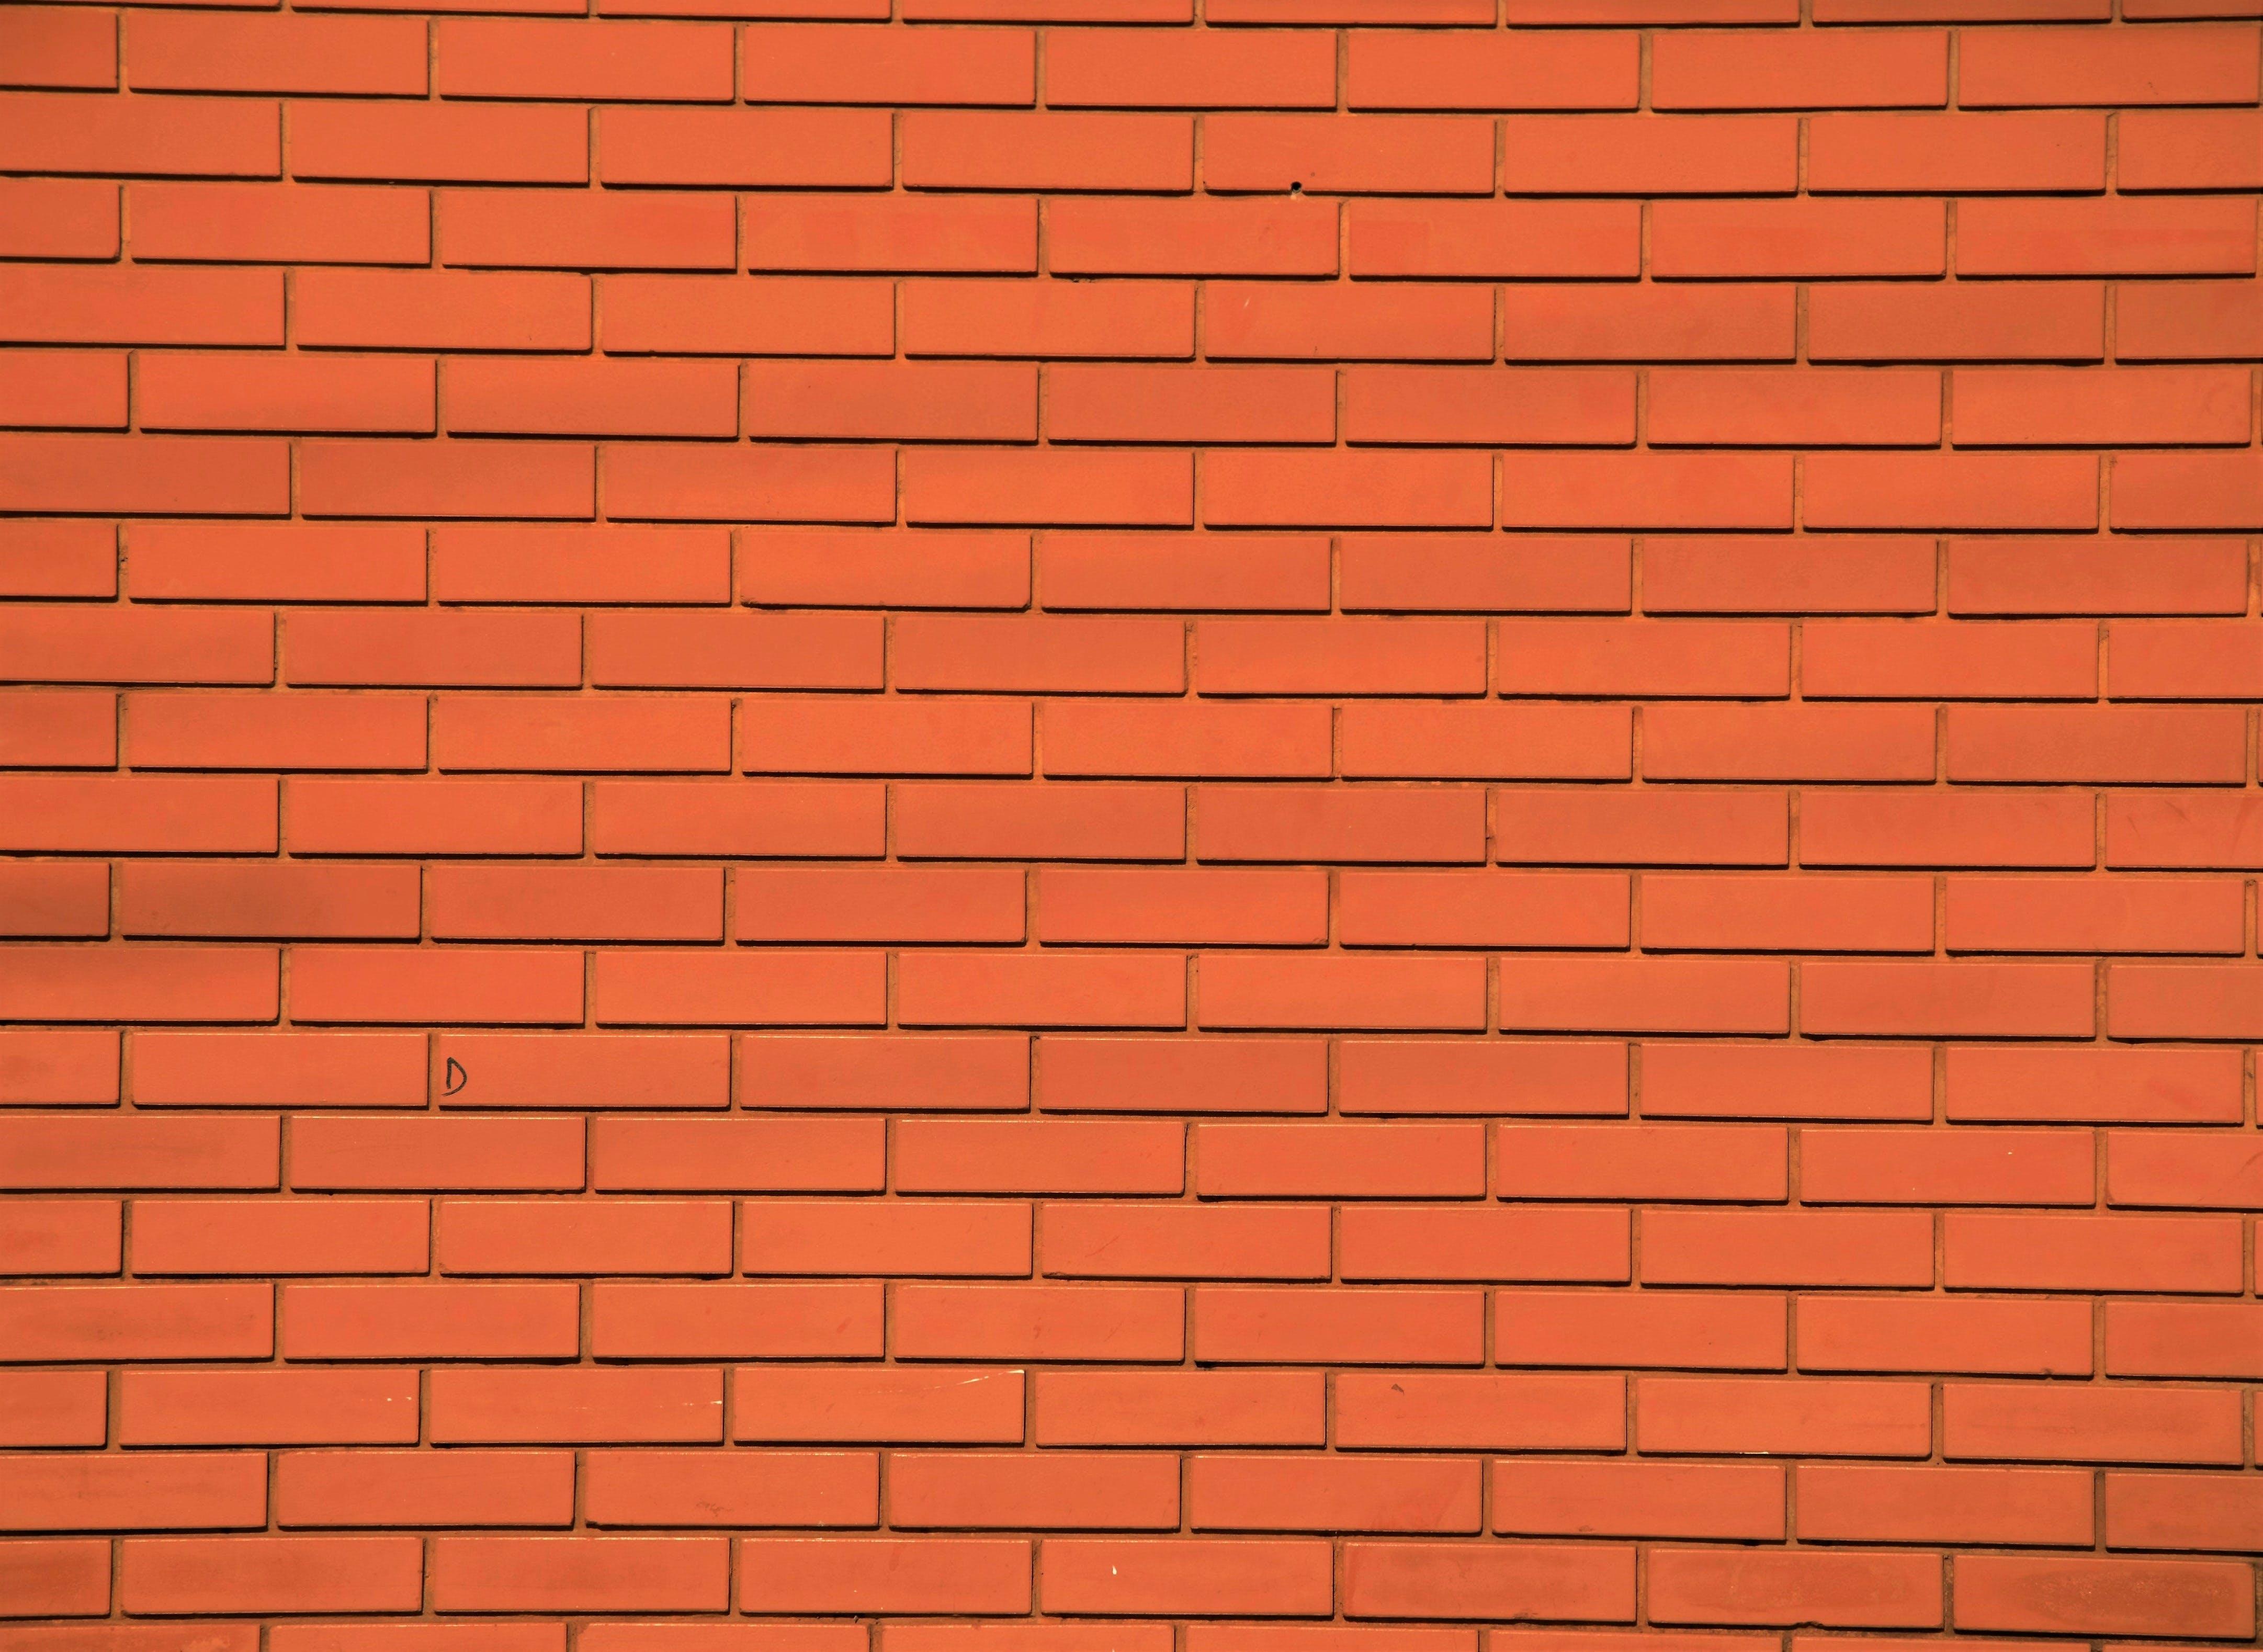 background, brick, bricks